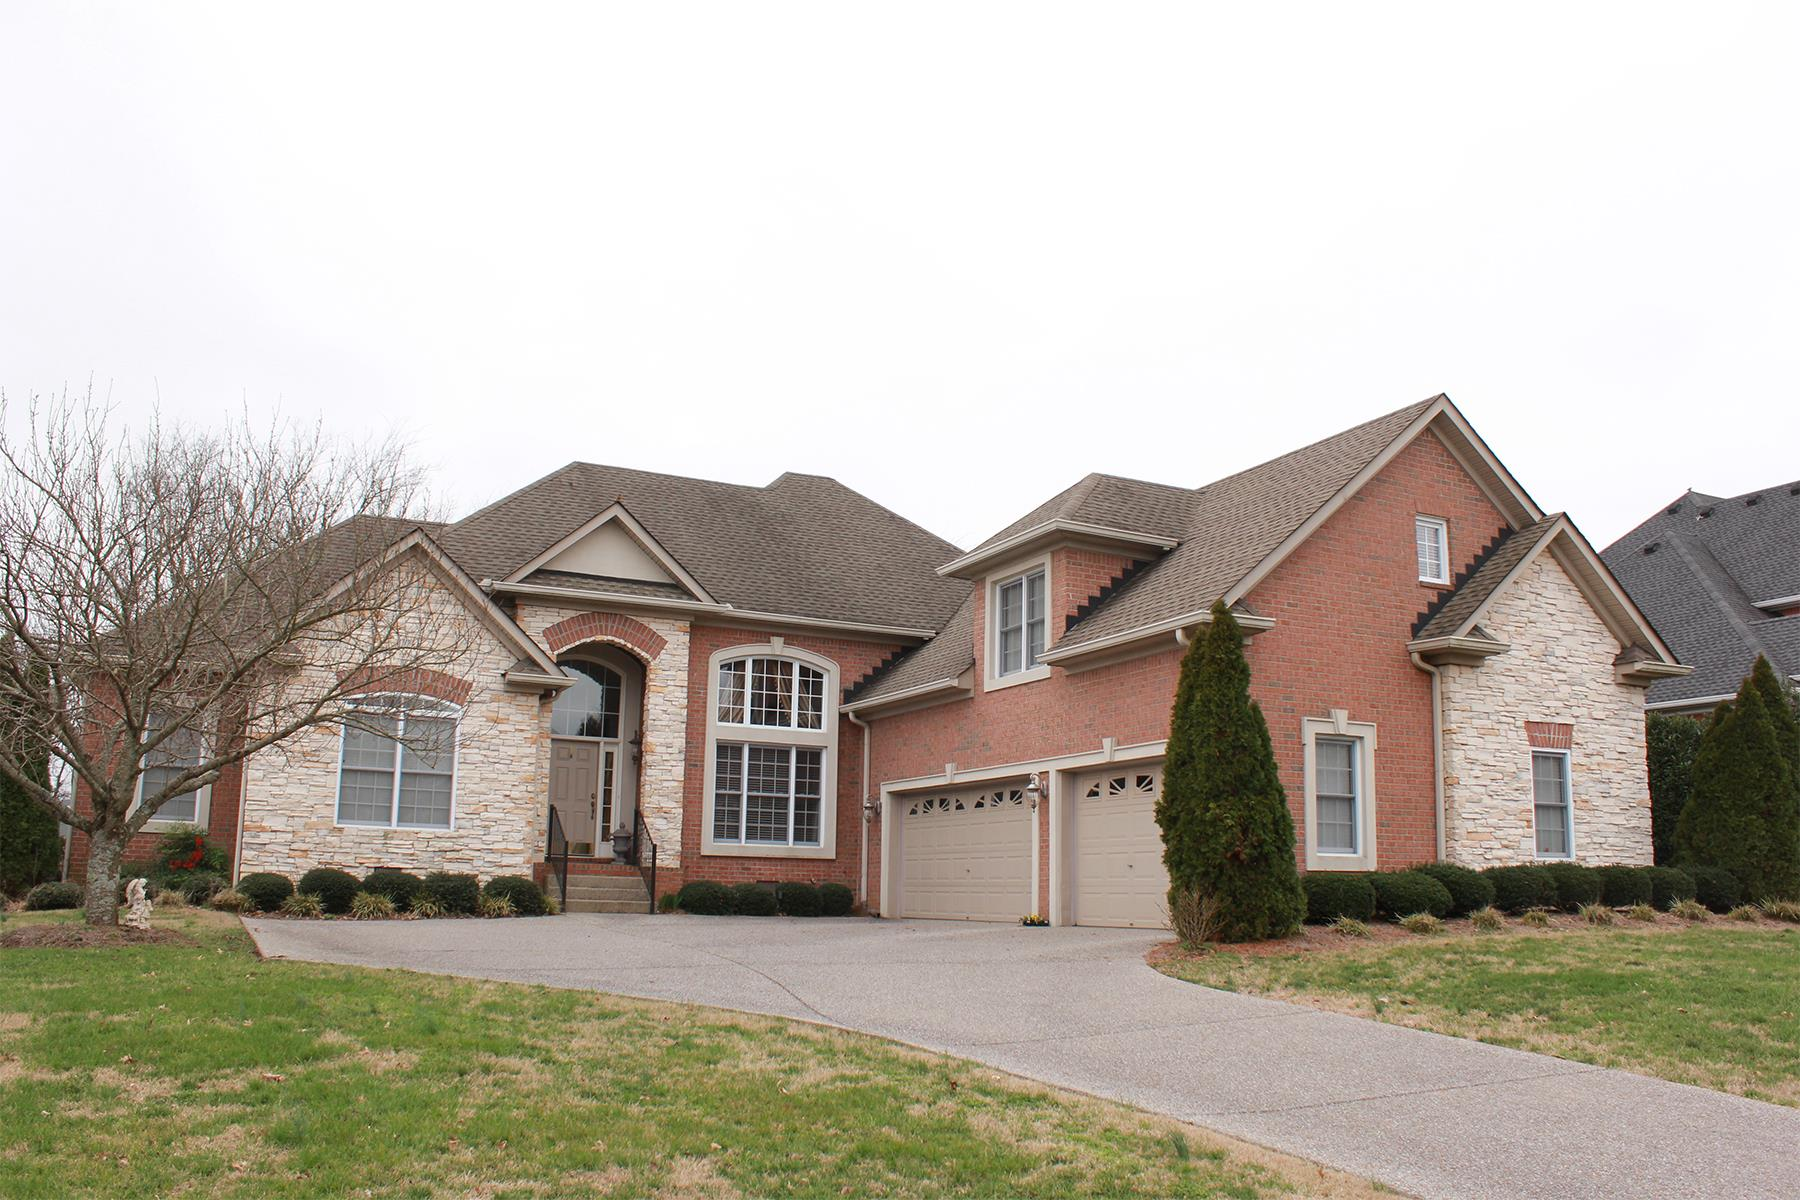 2049 Rodman Blvd, Gallatin, TN 37066 - Gallatin, TN real estate listing